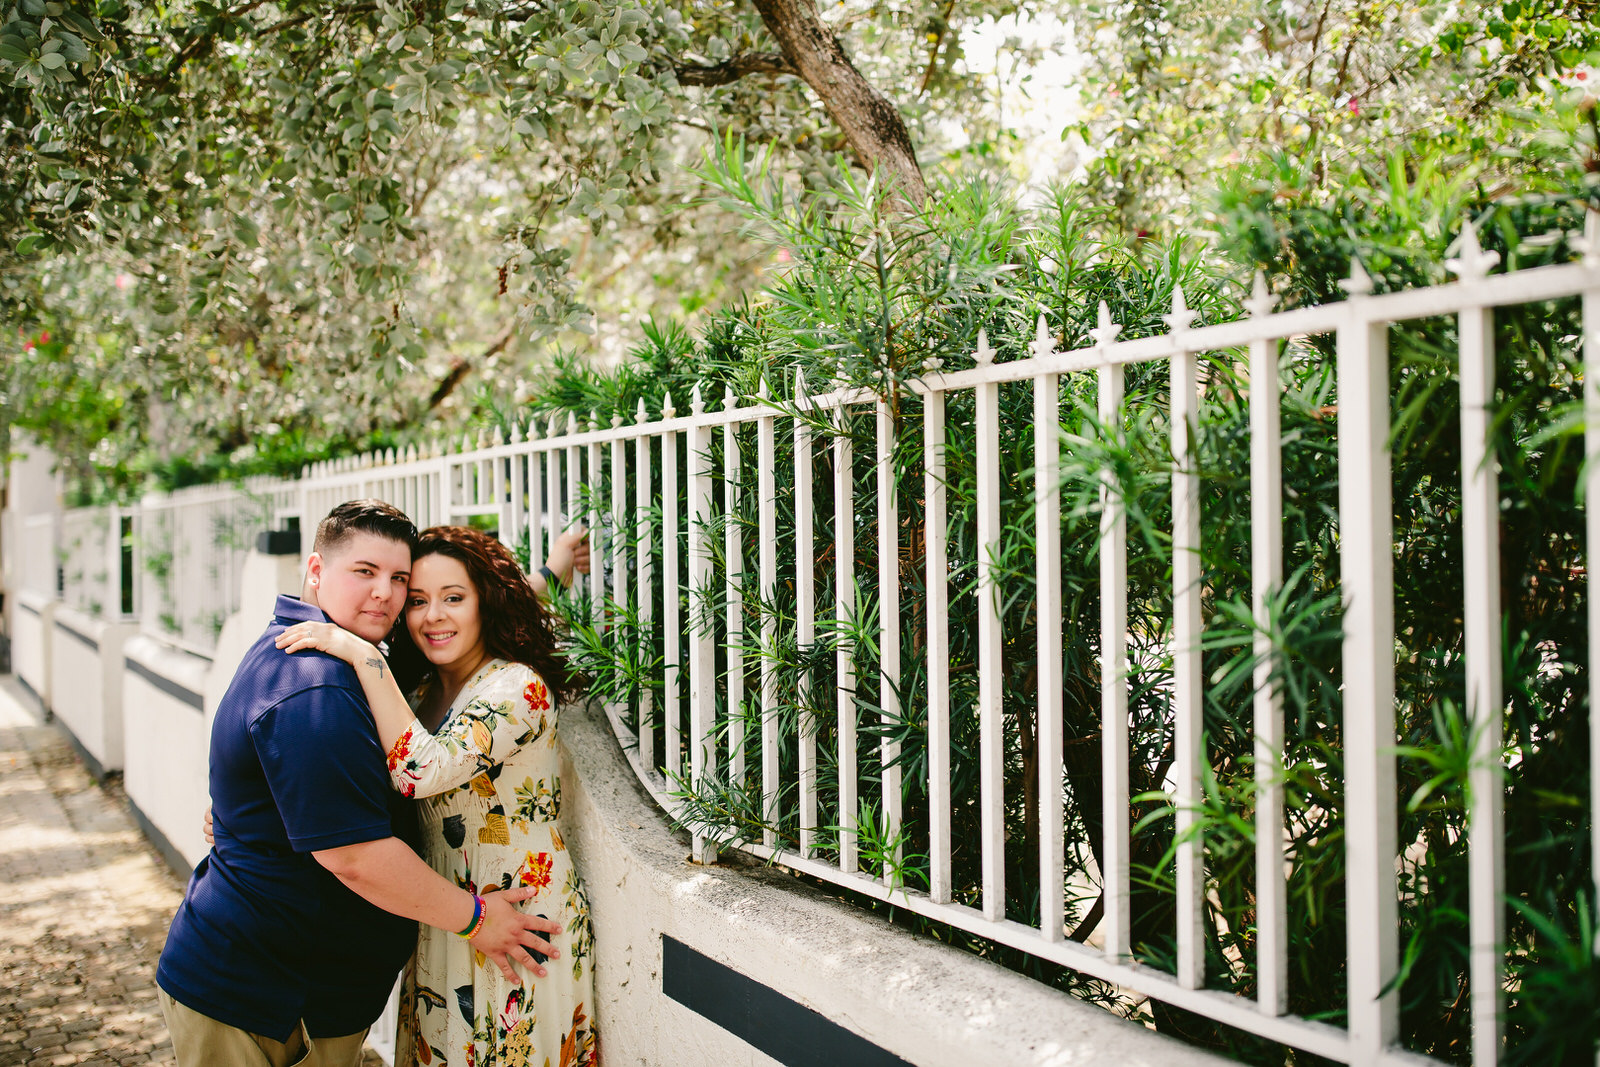 florida-same-sex-wedding-photographer-tiny-house-photo-destination-weddings.jpg